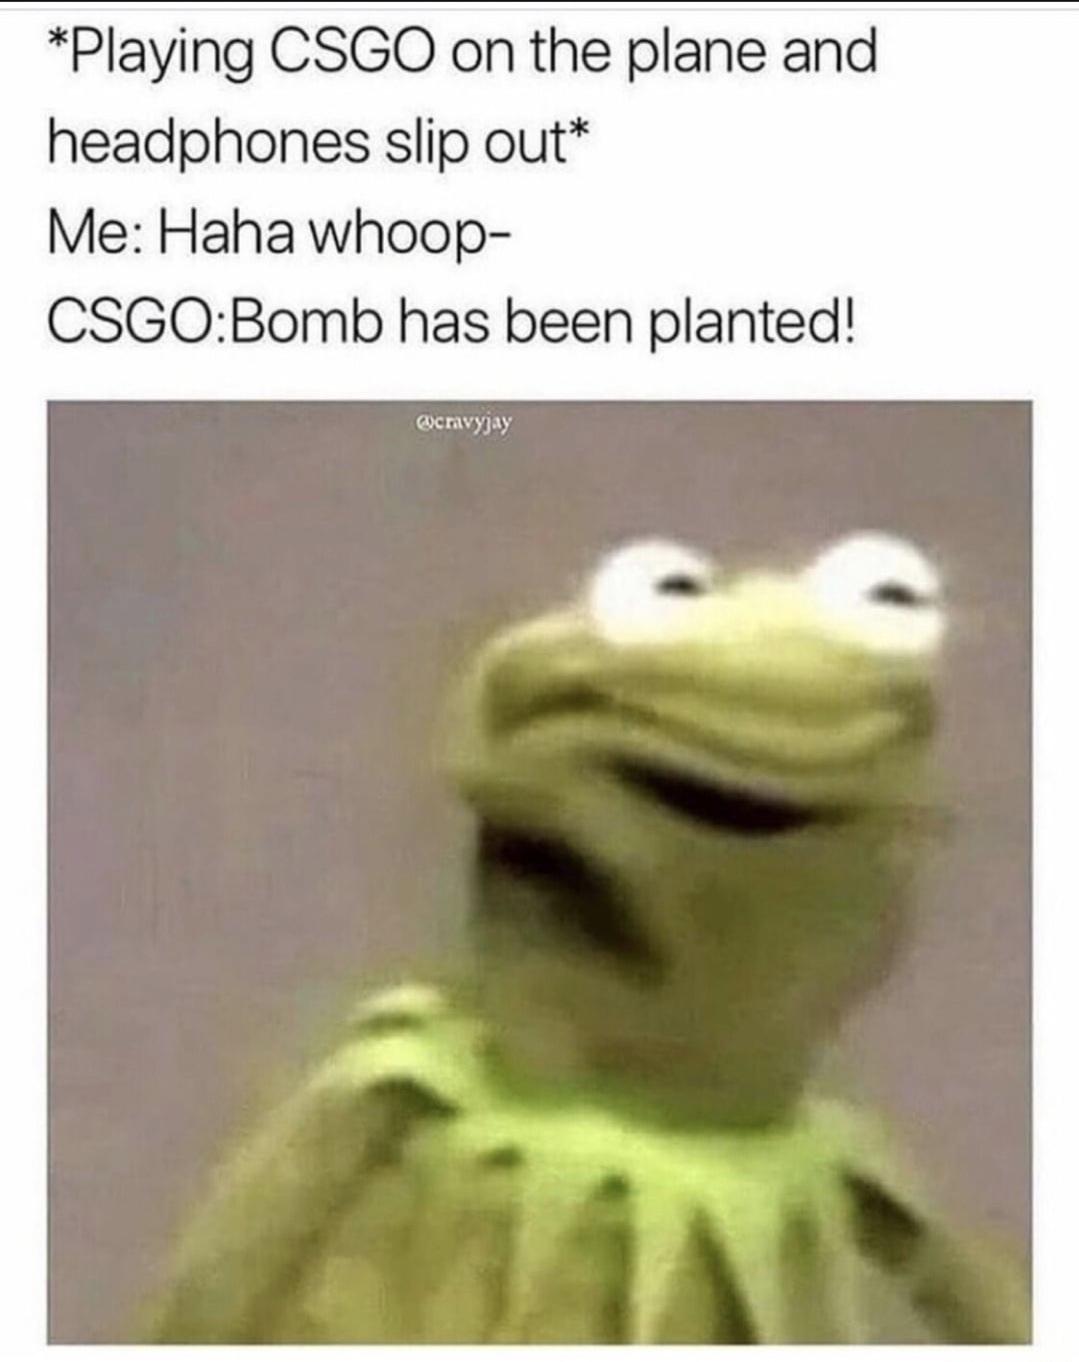 Y u don't bring a computer - meme